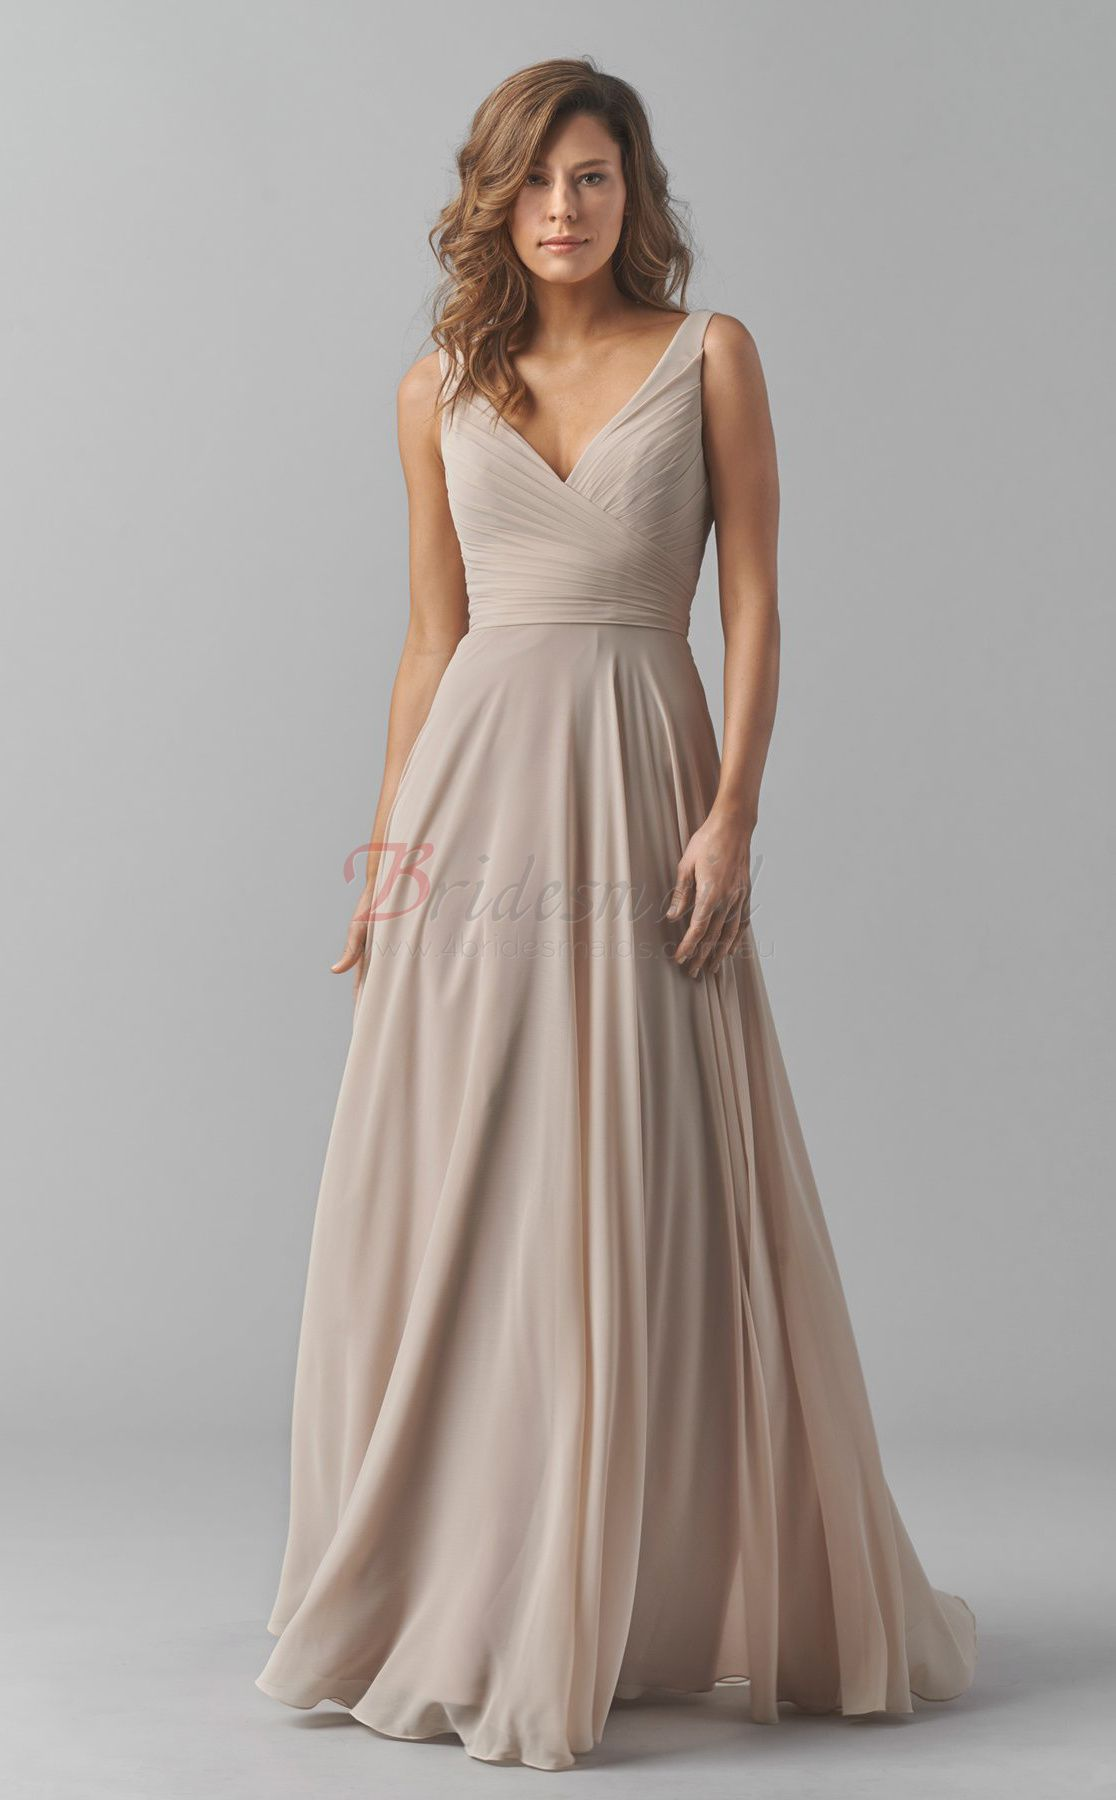 Gray aline chiffon vneck long bridesmaid dressesbd jenus